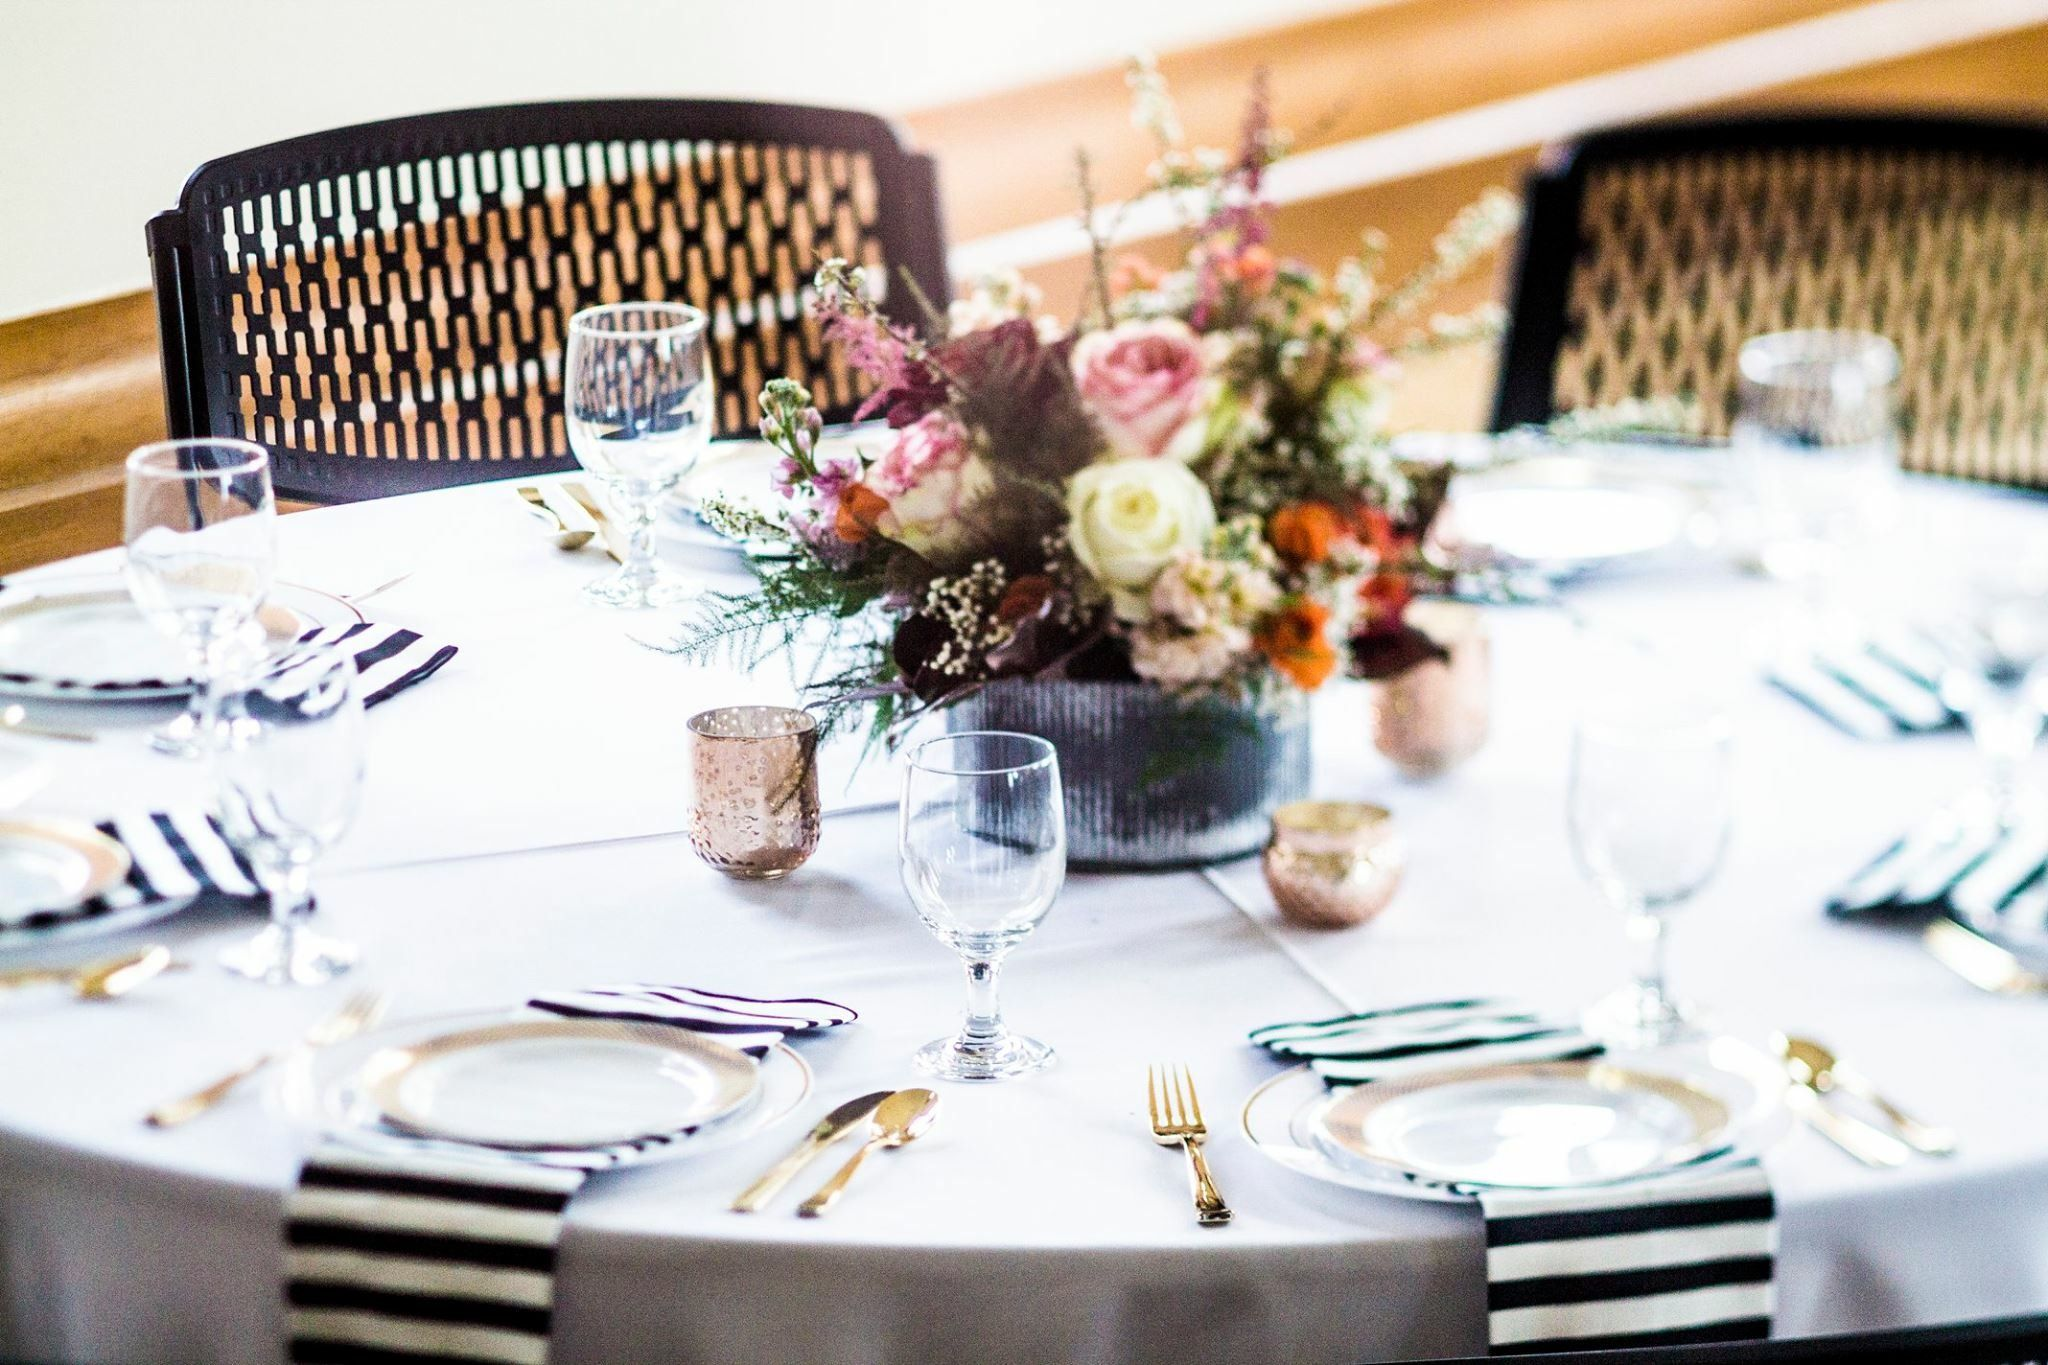 Wedding Table Decor Black And White Striped Napkins Gold Decor